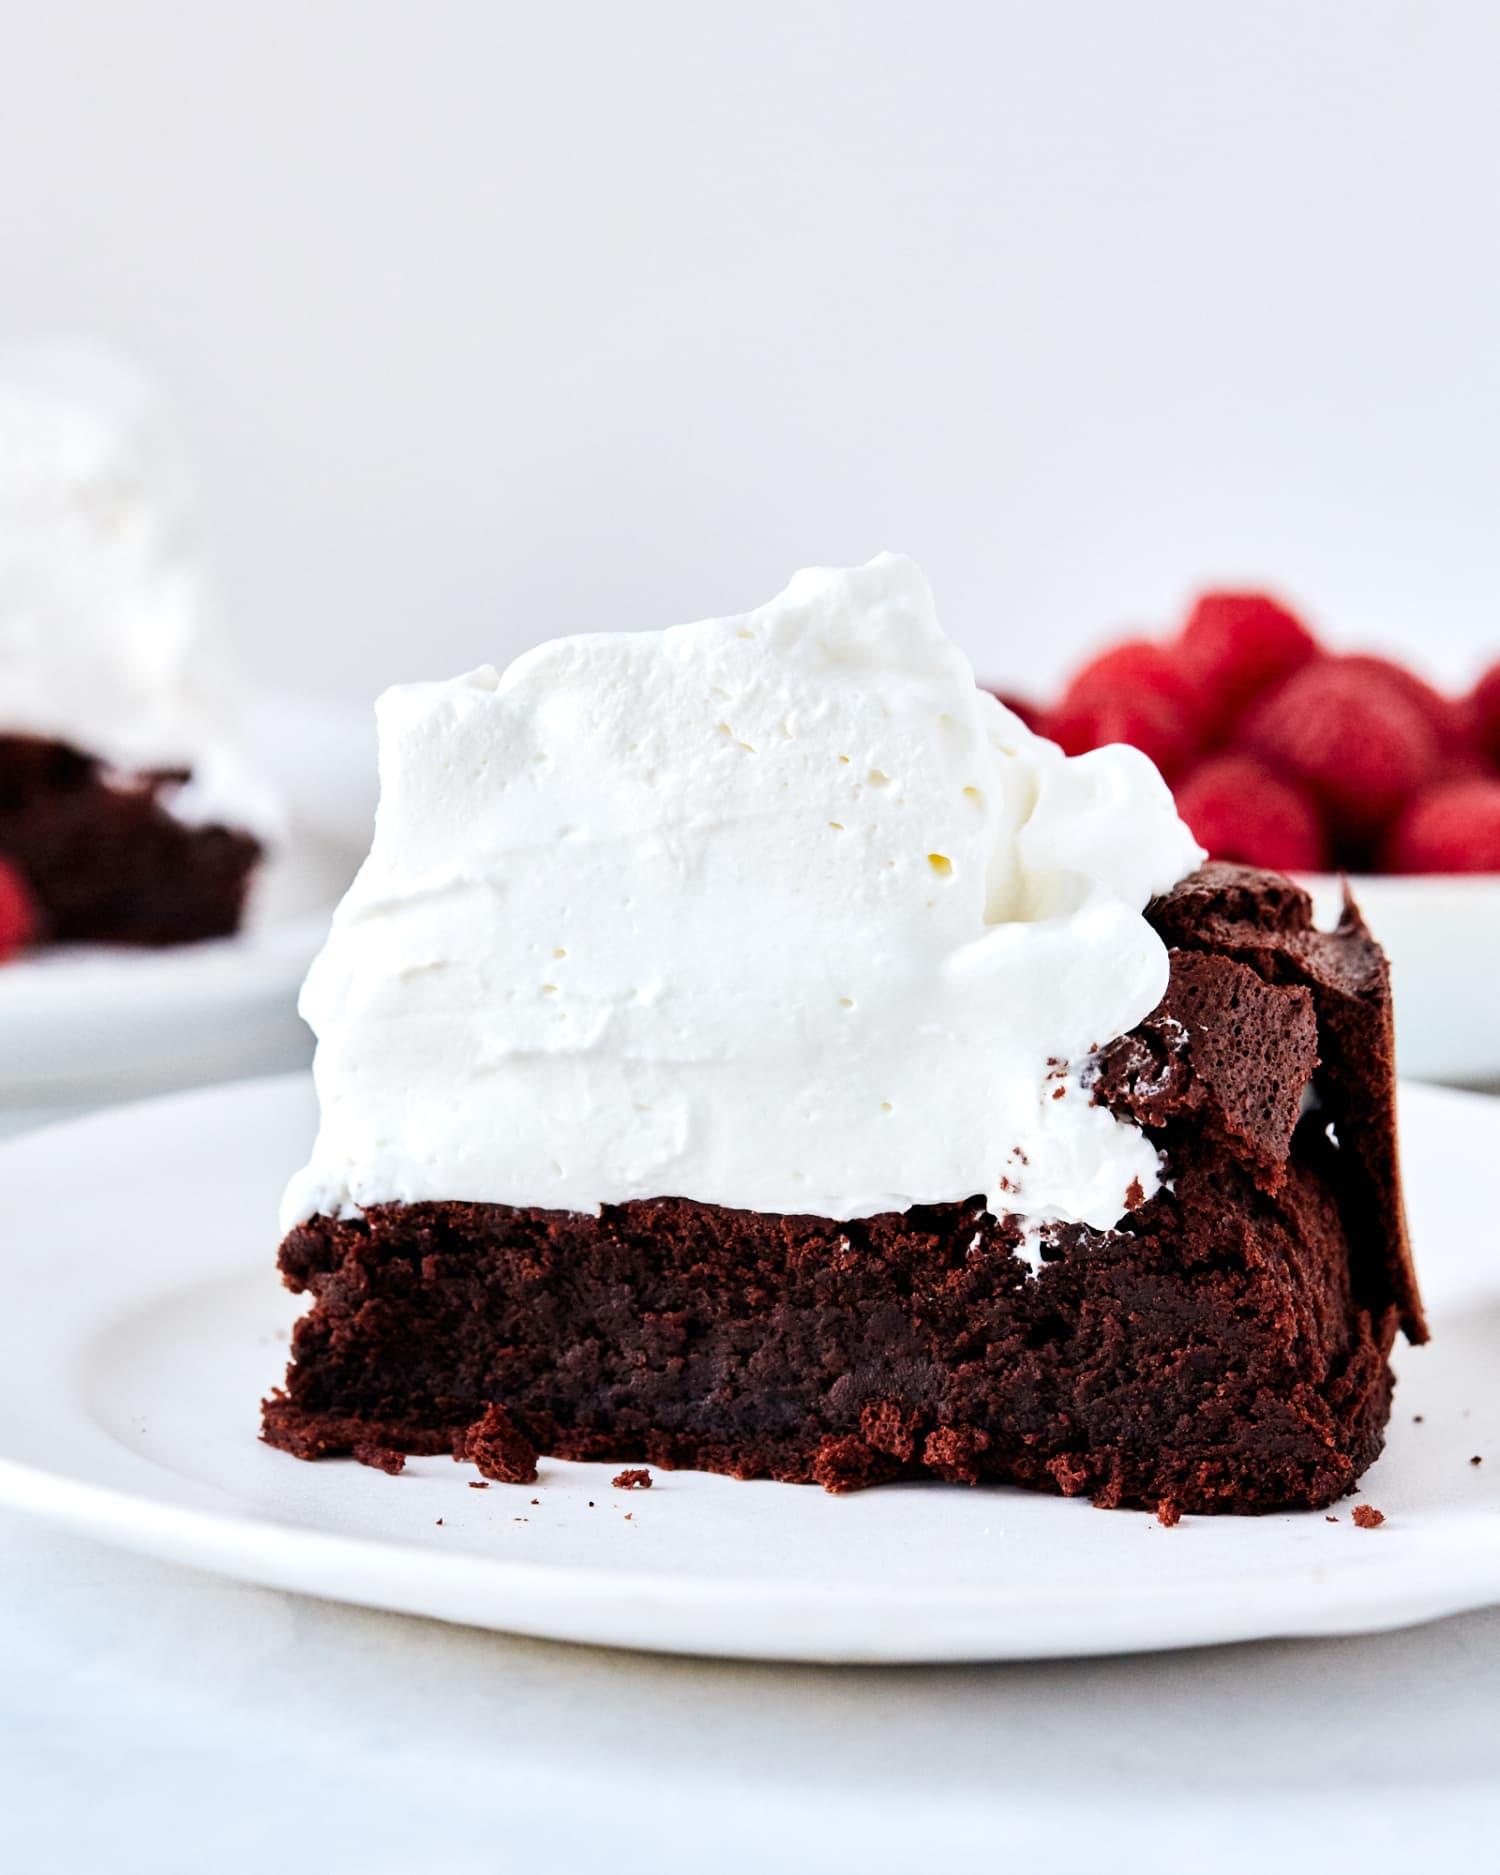 Recipe: 5-Ingredient Flourless Chocolate Cloud Cake